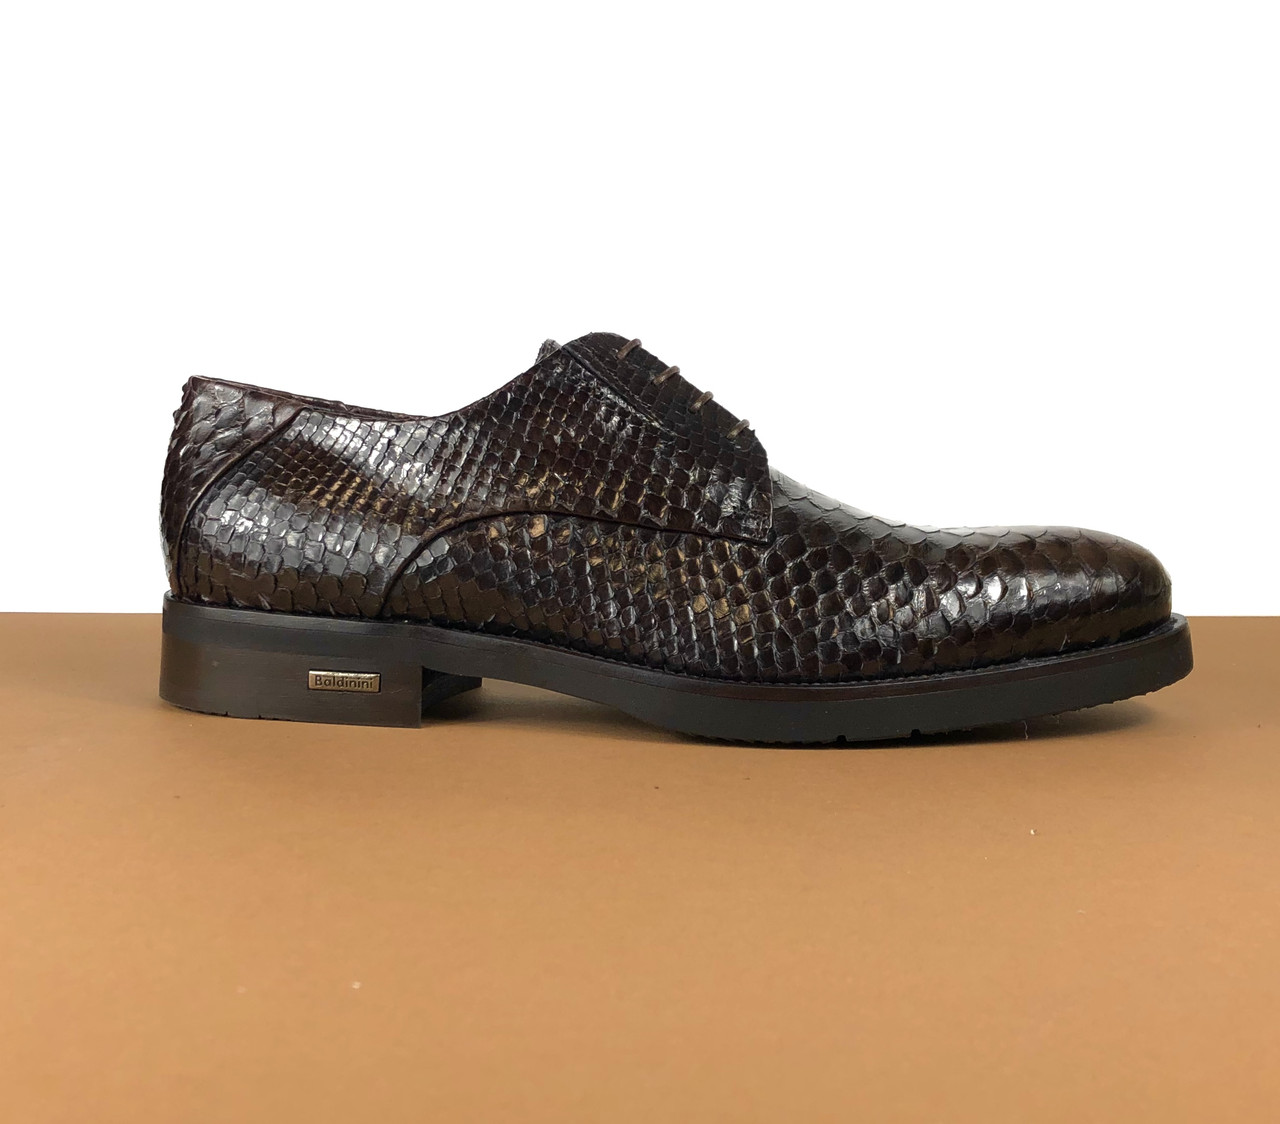 Туфли Baldinini из кожи питона (Балдинини) арт. 39-0002